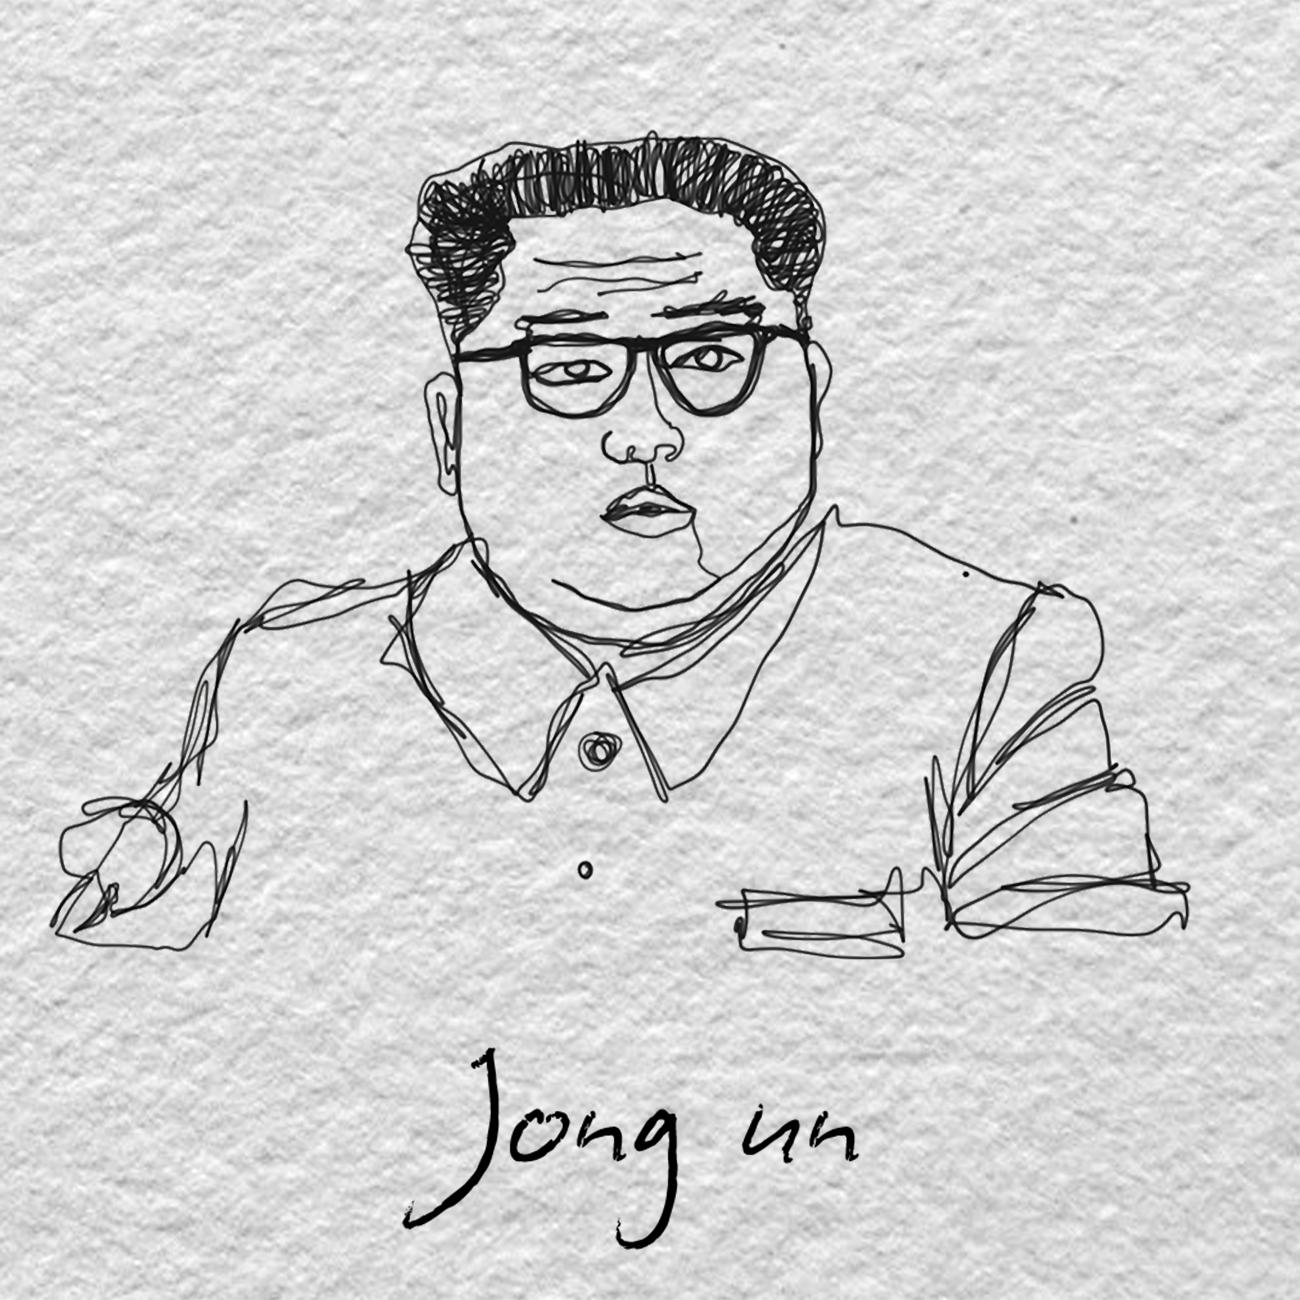 world-leaders-jong